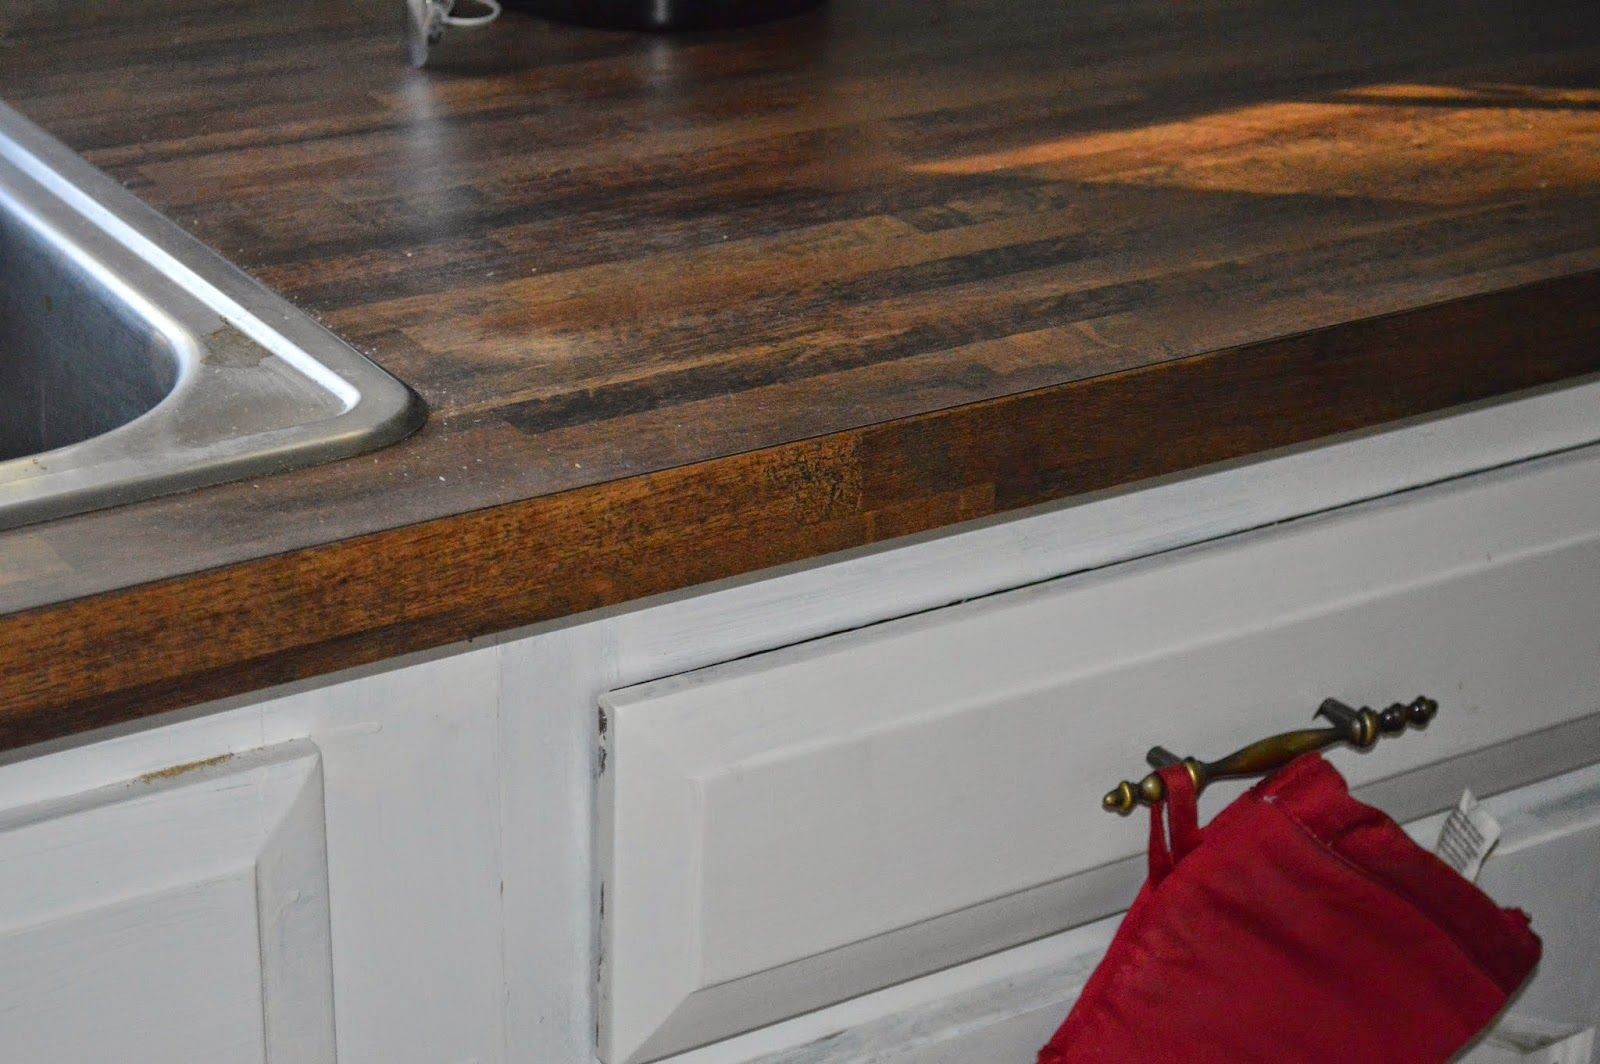 Laminate Butcher Block Kitchen Countertops : old mill oak wilsonart - Google Search Home Sweet Home Wilsonart laminate countertops ...